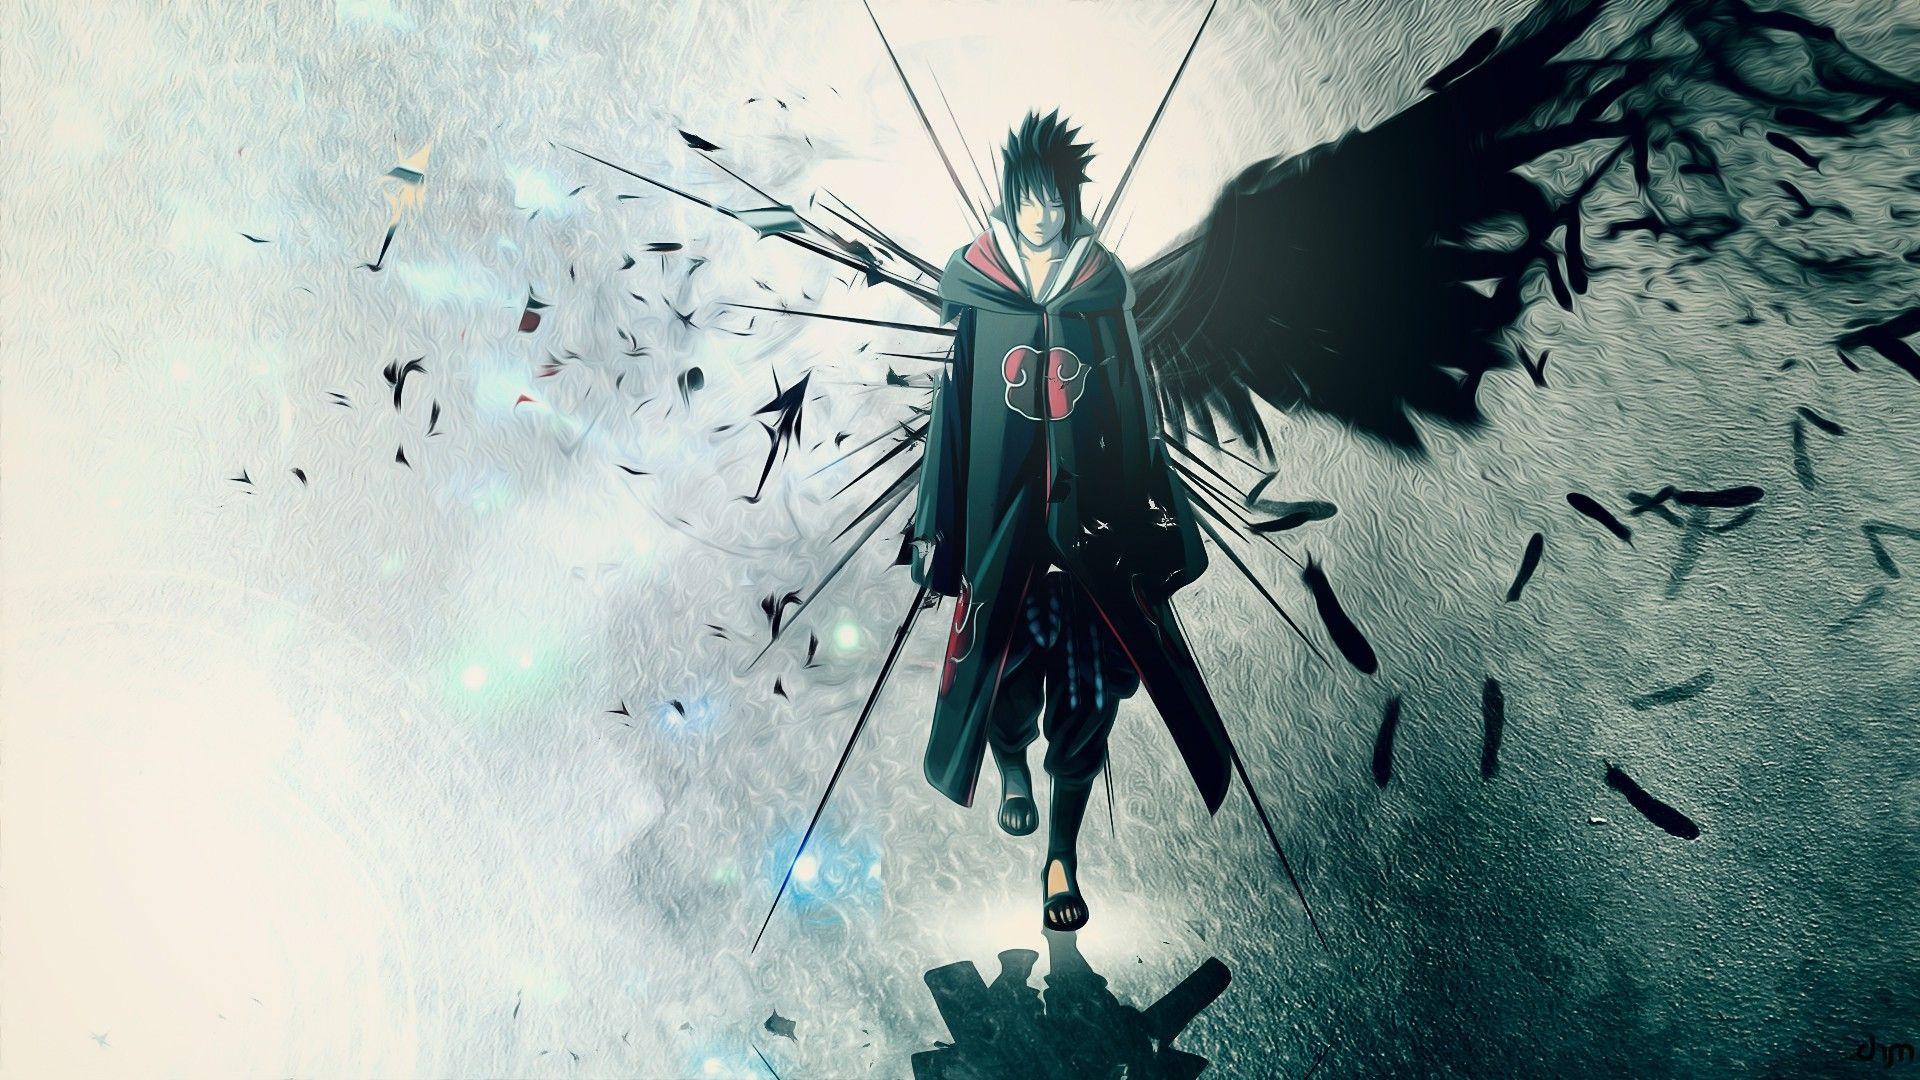 Naruto-hd-http-azzi-net-anime-naruto-shippuden-a-wallpaper-wp3608870